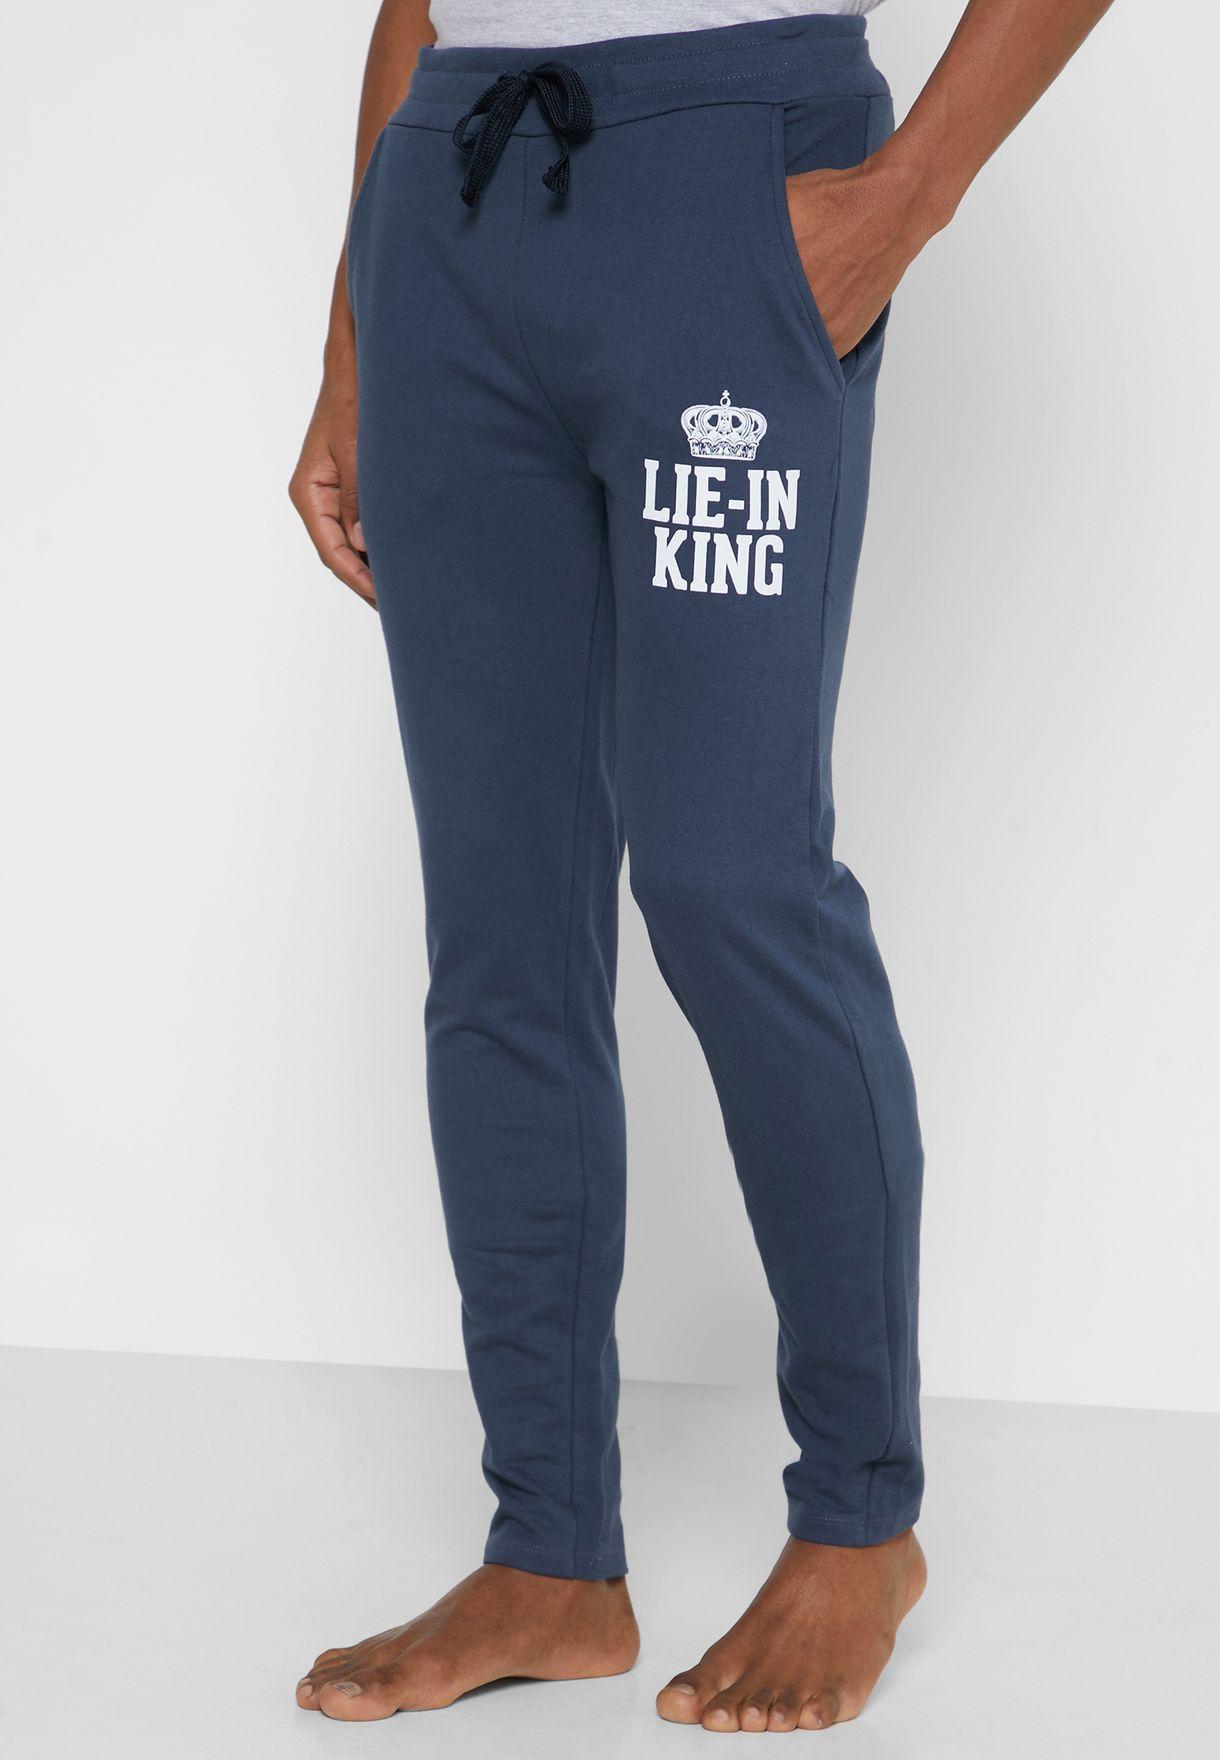 Lie-In King Pyjama Set